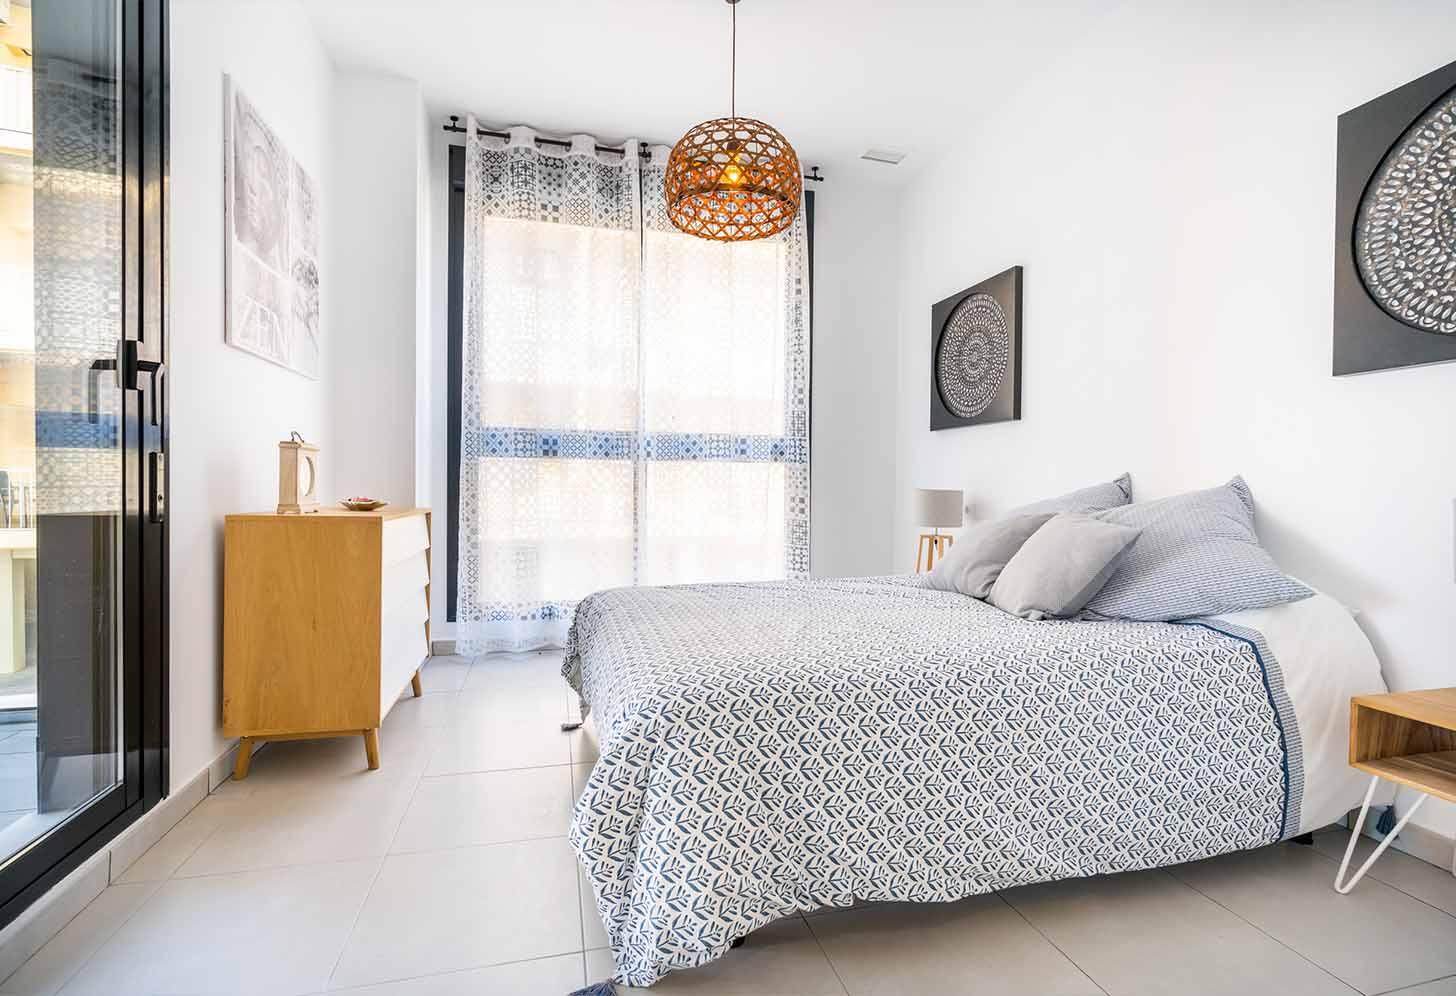 immobilier neuf espagne costa blanca on-m1 calpe beach II chambre 2